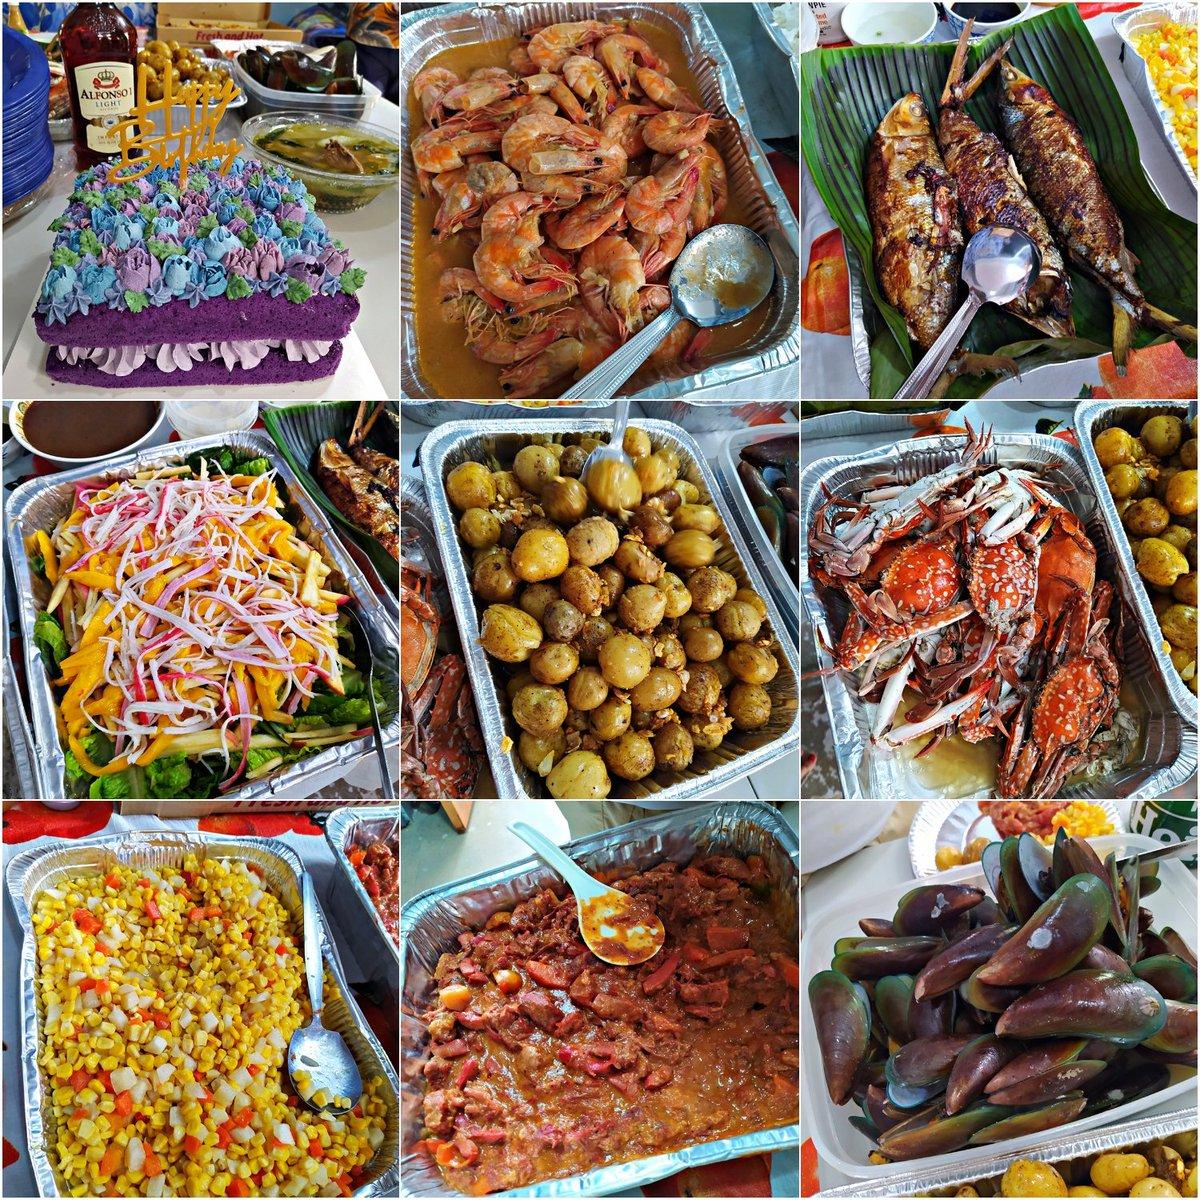 #birthdaycelebration #HappyBirthdayToMe 🥳🥳  #lechon #butteredshrimp #mussels #crab #cornandcarrots #babypotatoes #sotanghon #snrpizza #milktea #cakes #kanisalad #grilledbangus #beefcaldereta #valenciana 🤤🤤🤤❤️❤️❤️  Thankyou lord for all the blessings! #27th #happybirthday